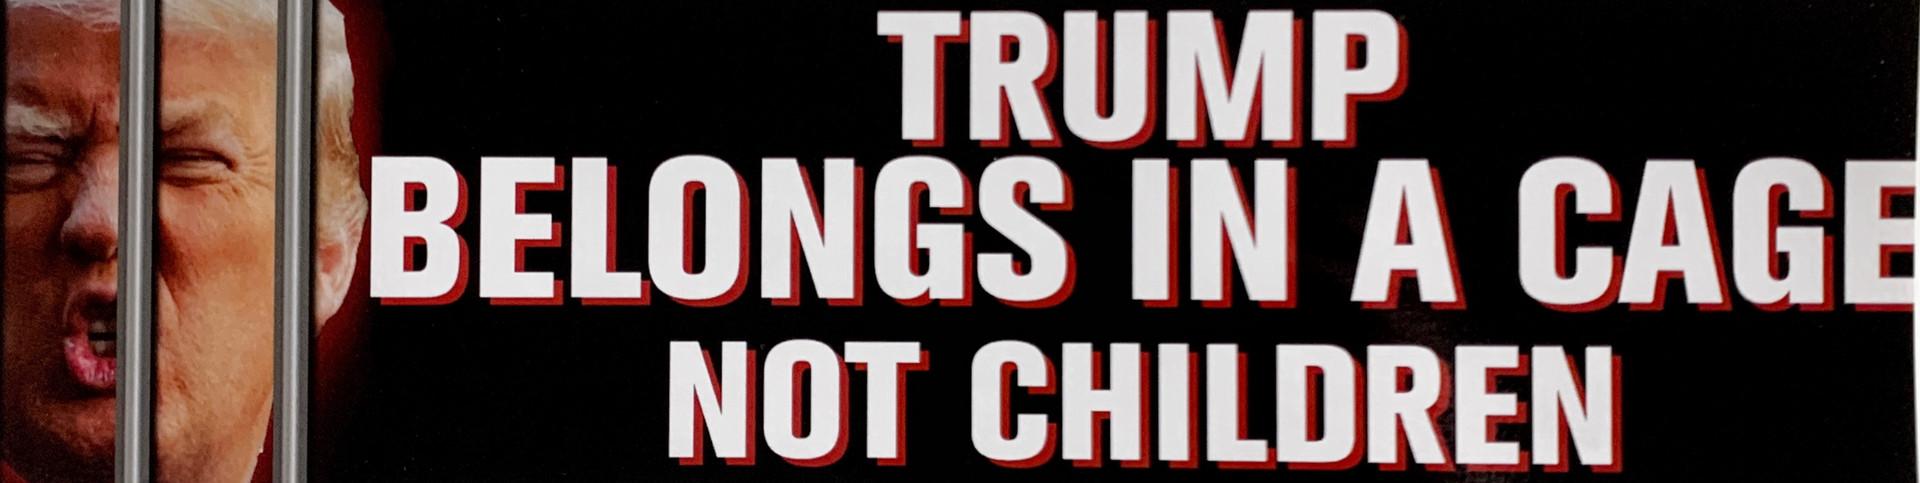 Trump Belongs in a Cage Not Children